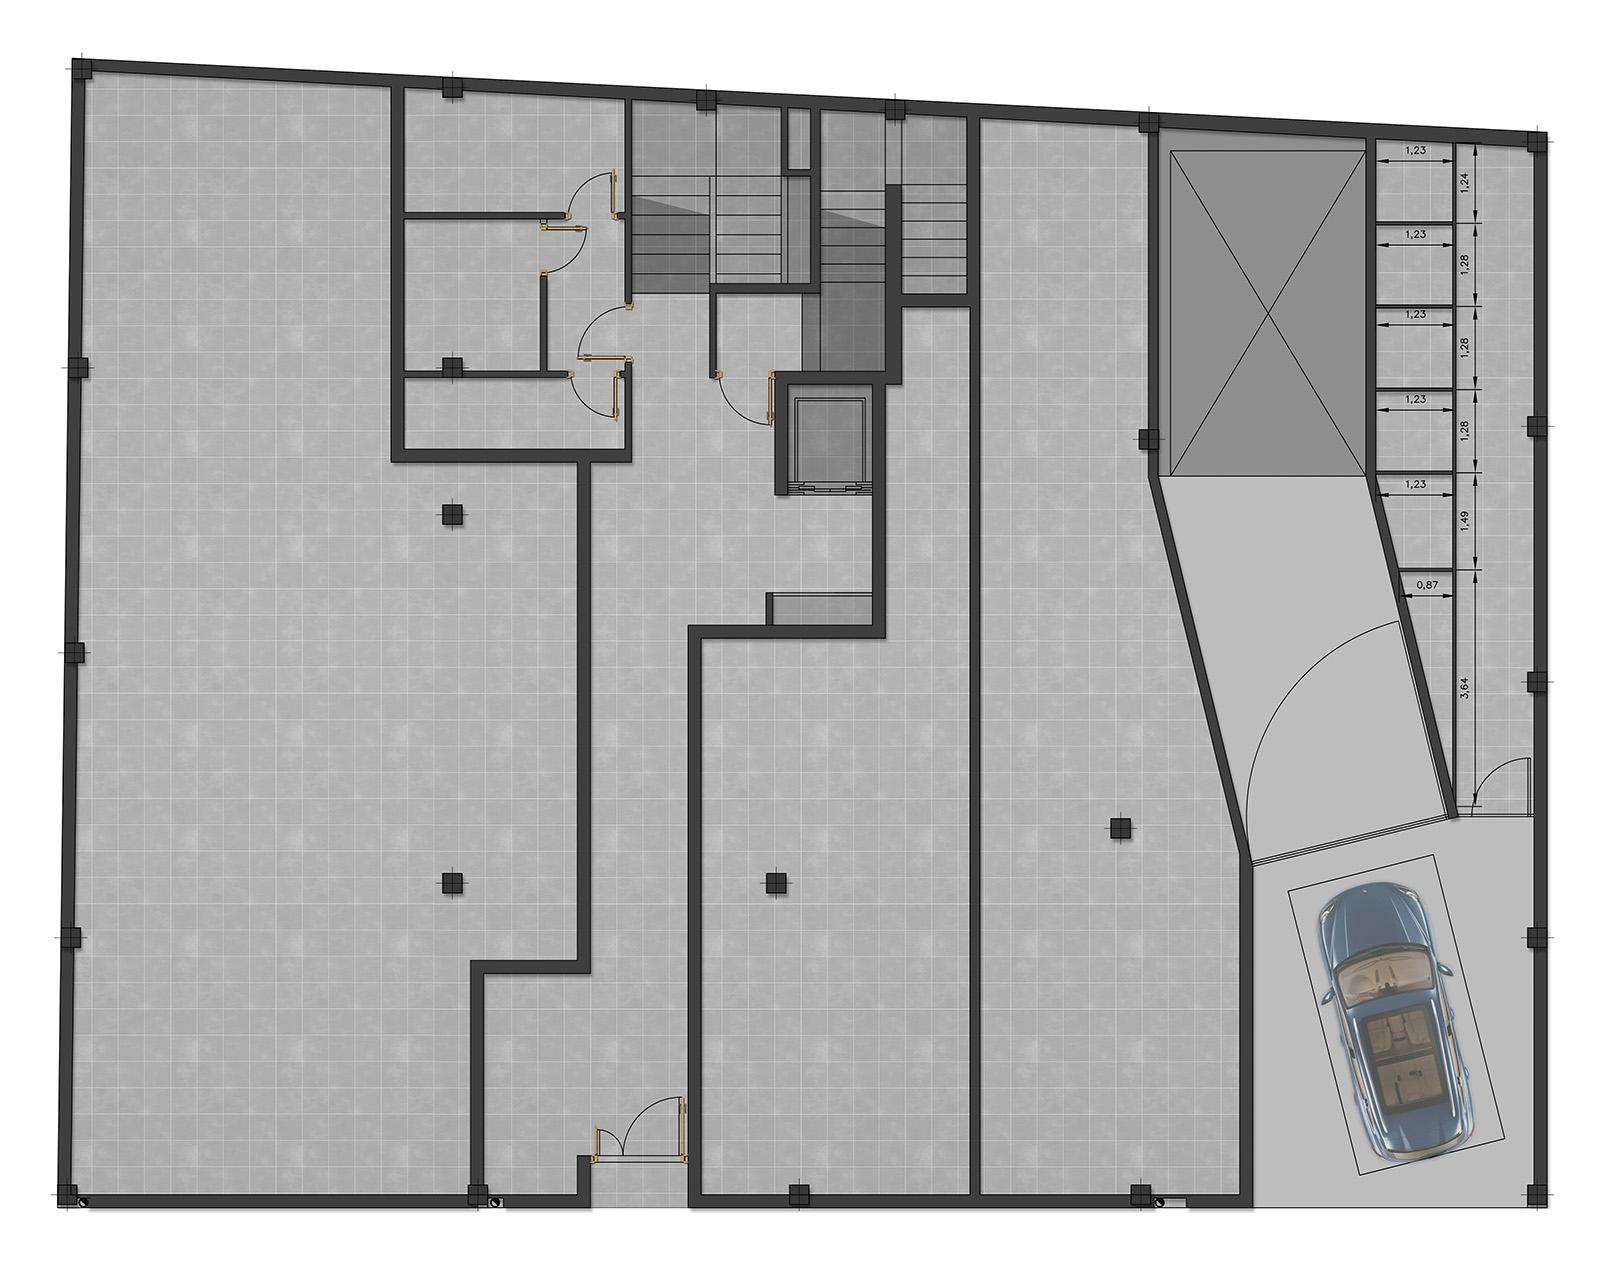 Planos 2d arquitectura y 3d valencia ardis3d proyectos for Programa planos 2d